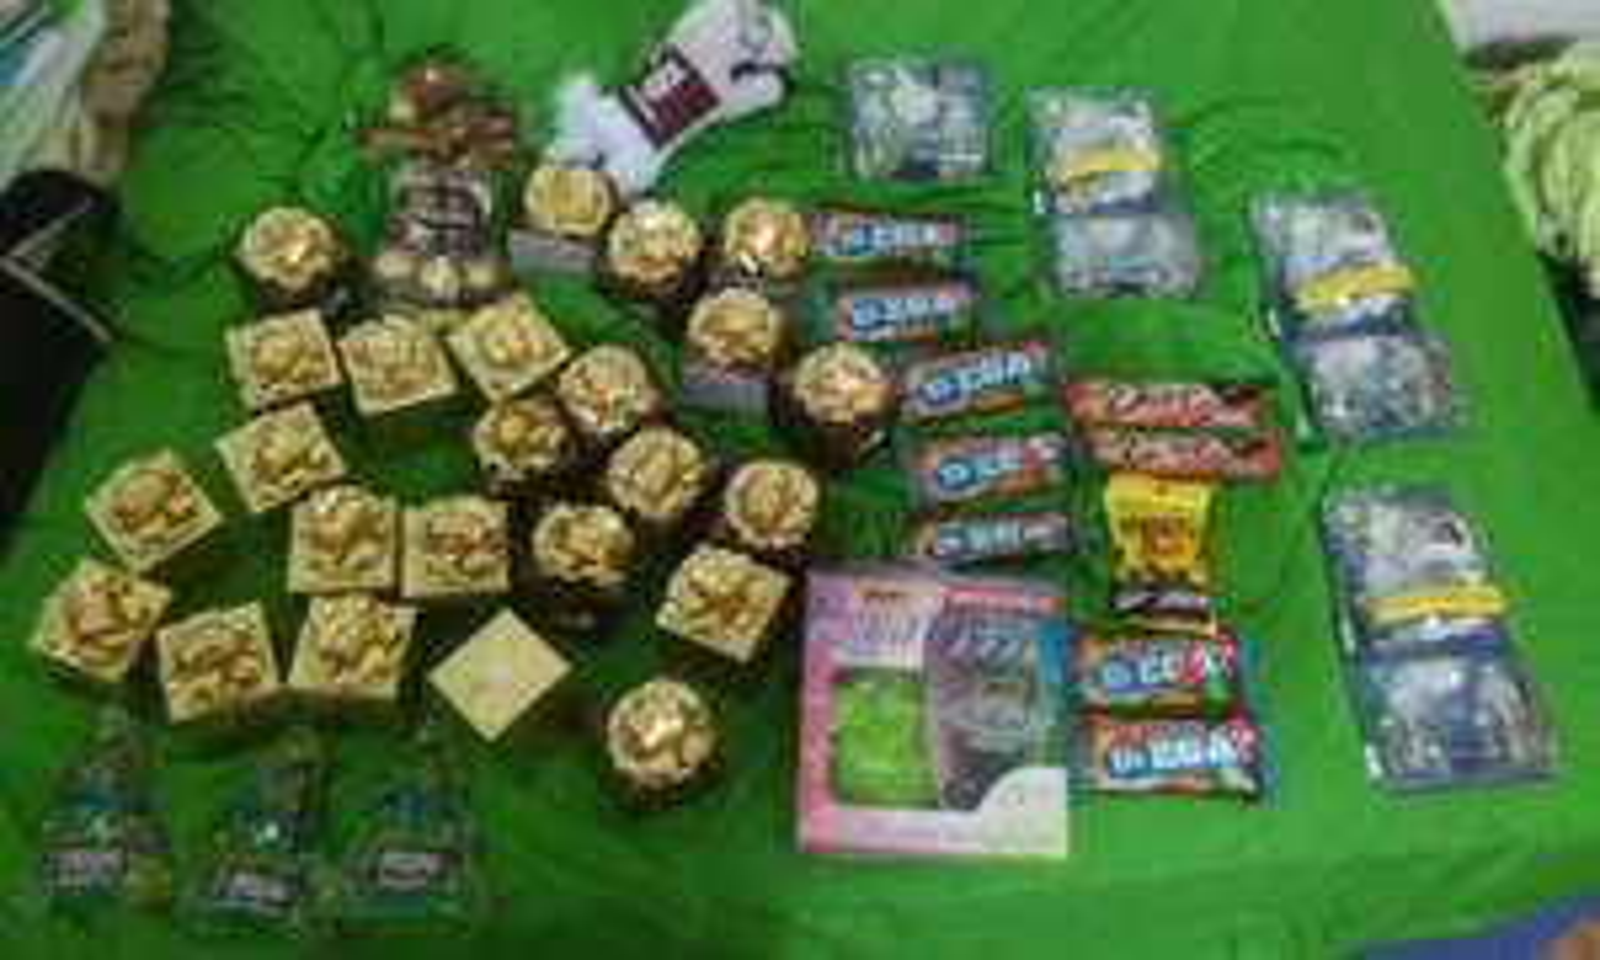 Chedraui: 4 rastrillos bic + esponja $2.10 / Ferrero caja c/6 $1 / Ferrero Campana c/16 $1 / Chocolate Dove Dark $1 / Air wick maquina y 3 repuestos $17.70 / Pelonetes $1